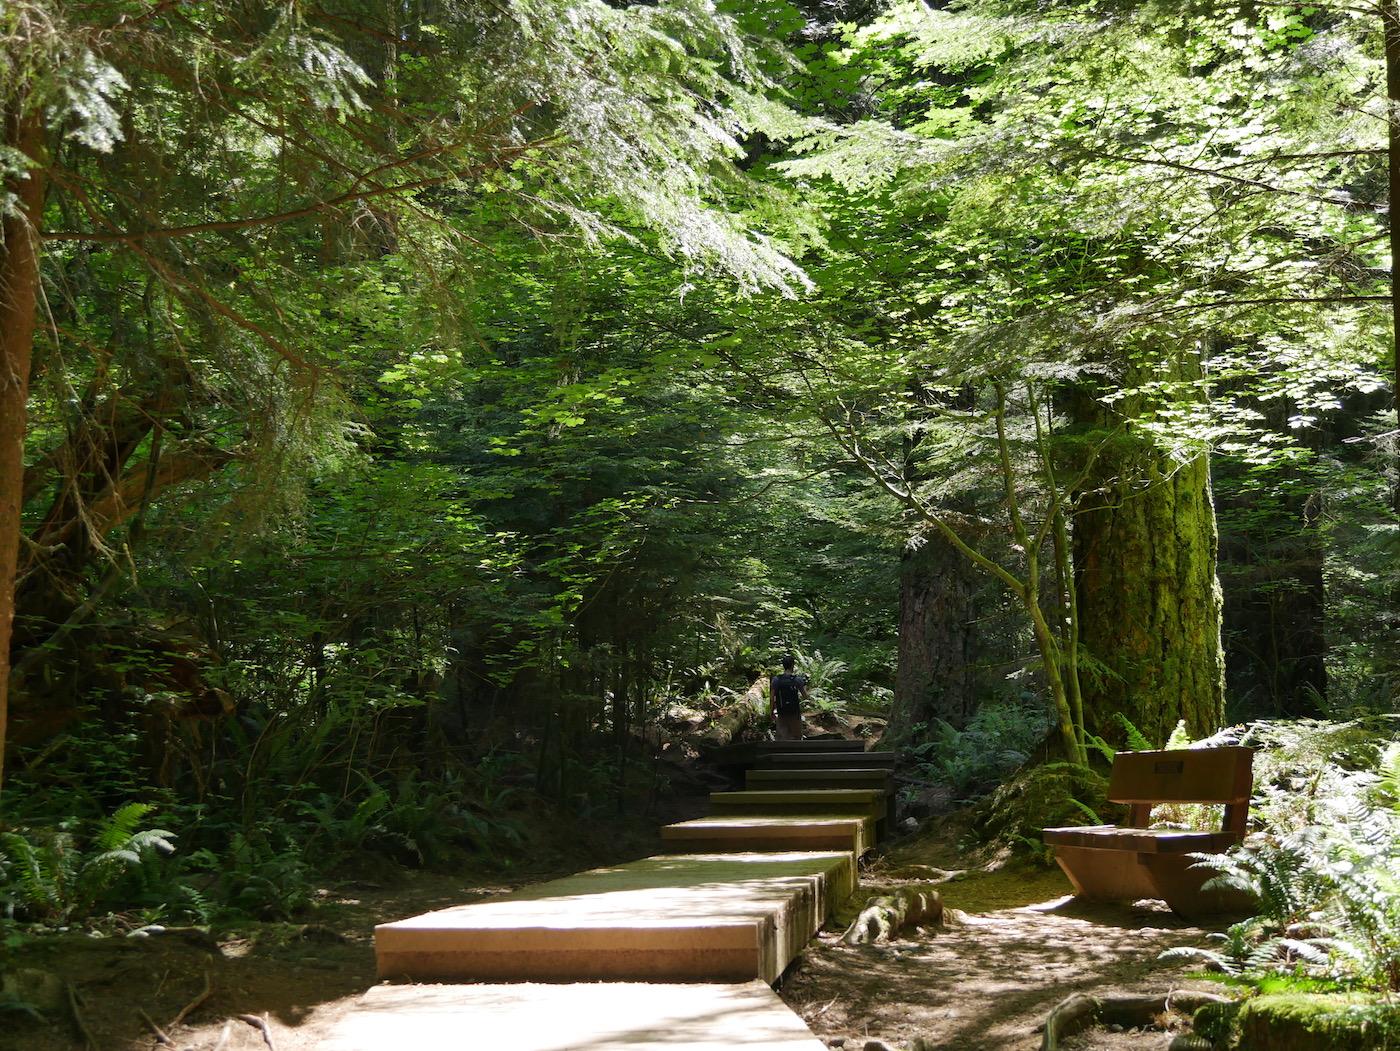 Escalier Lynn Canyon Park